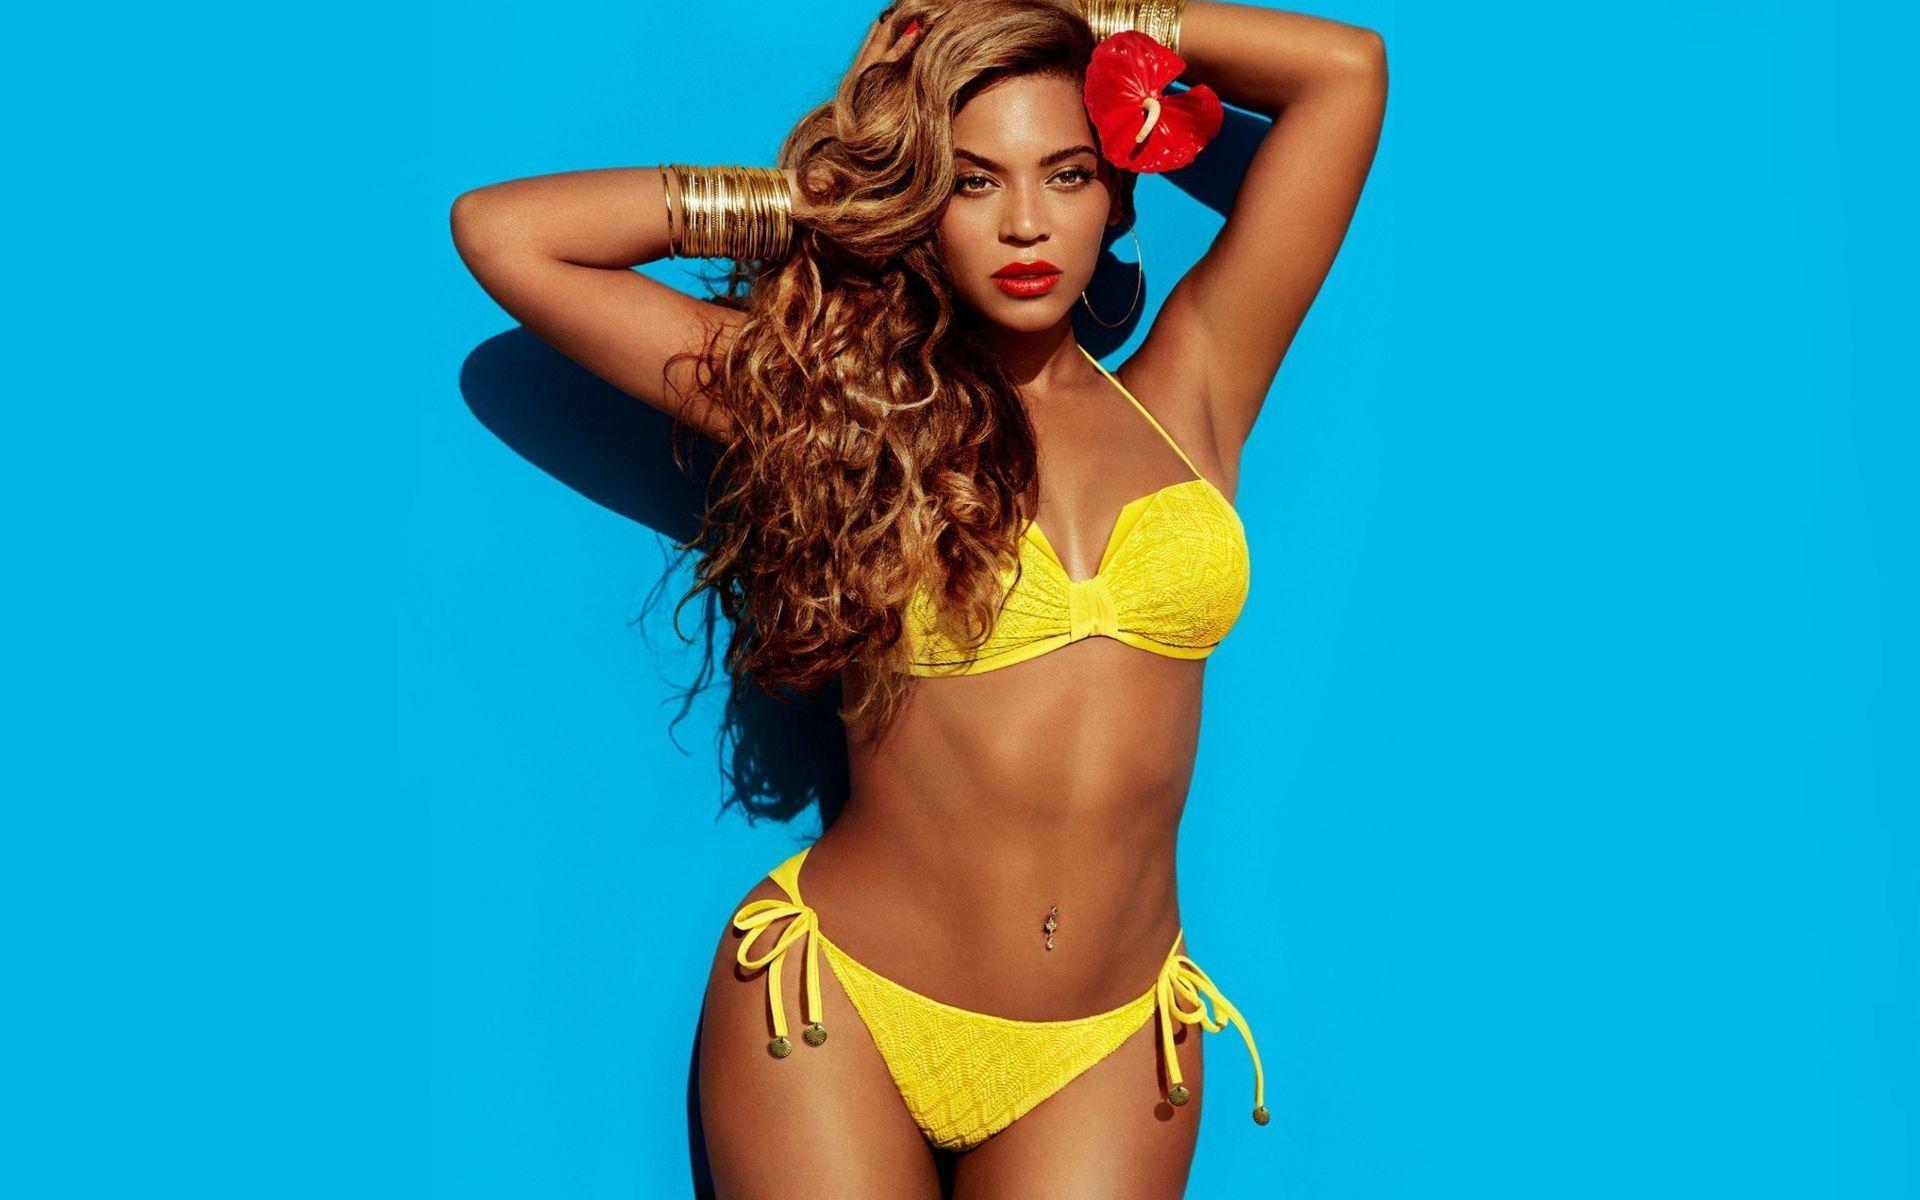 Beyonce knowles bikini pics #2